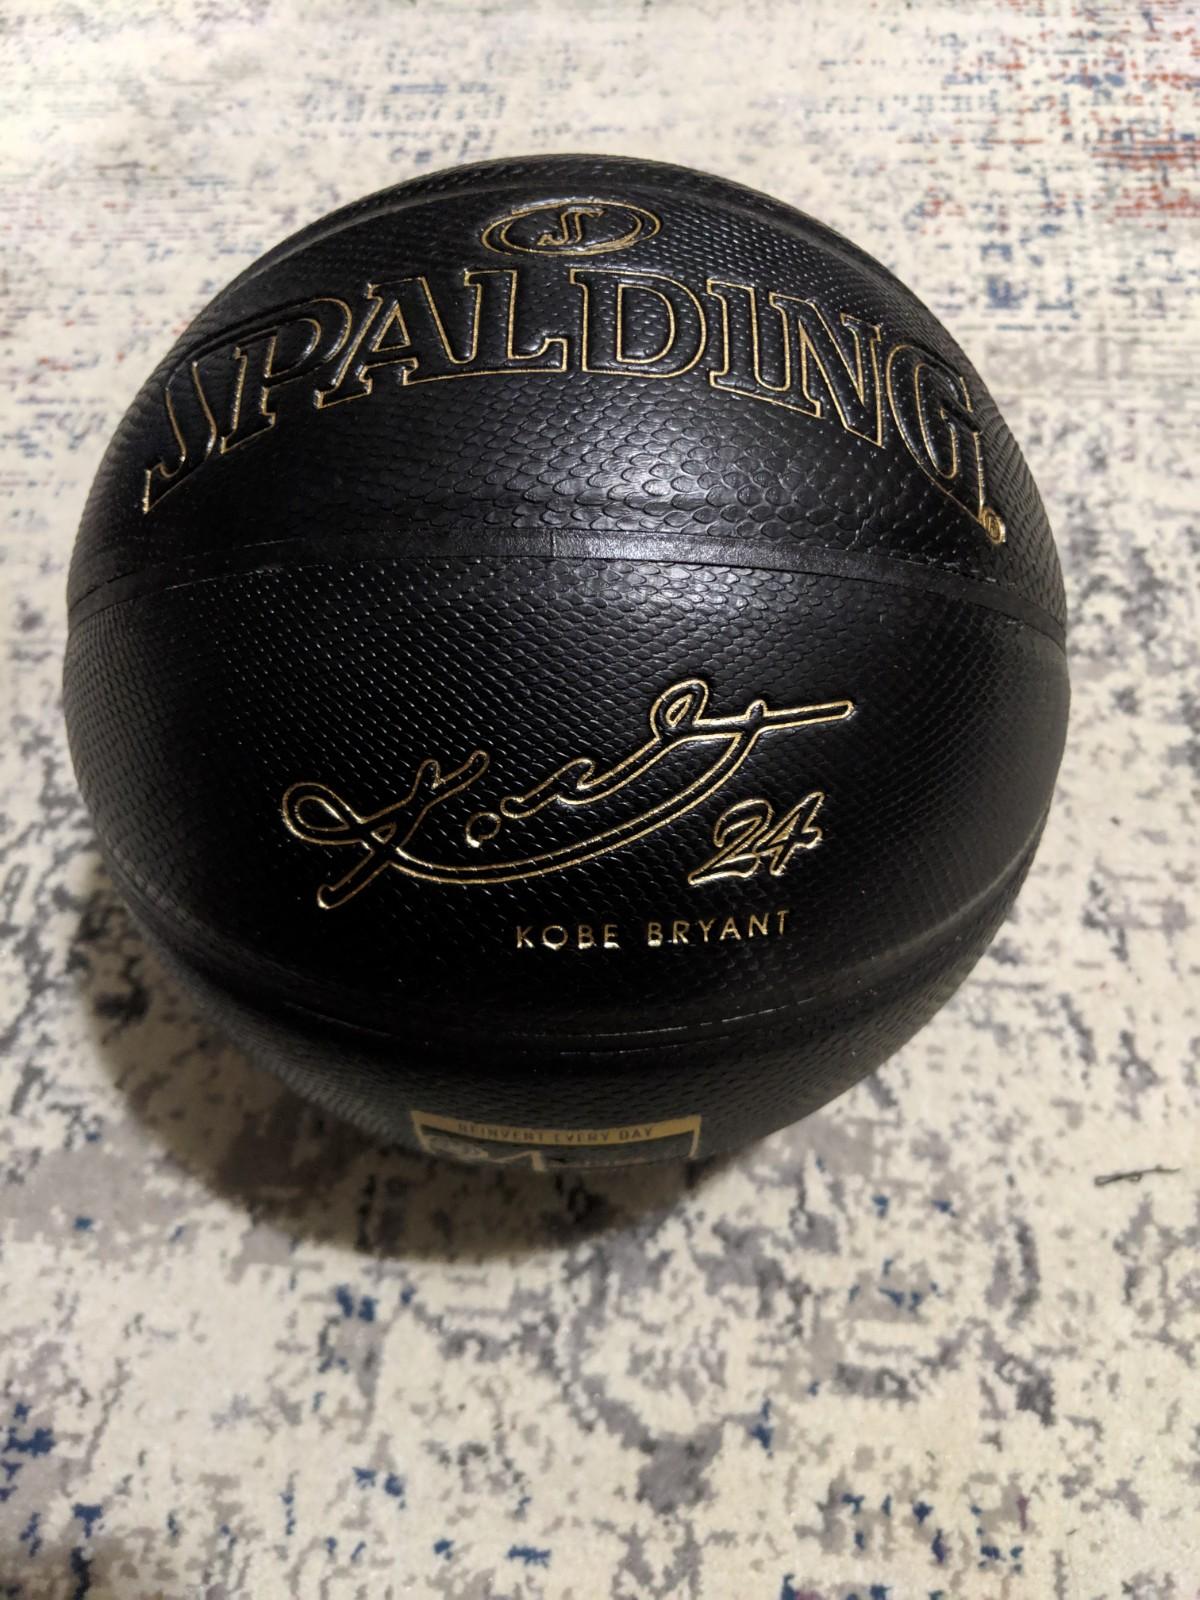 Spalding Debuts Kobe Bryant 24k Limited-Edition Basketball